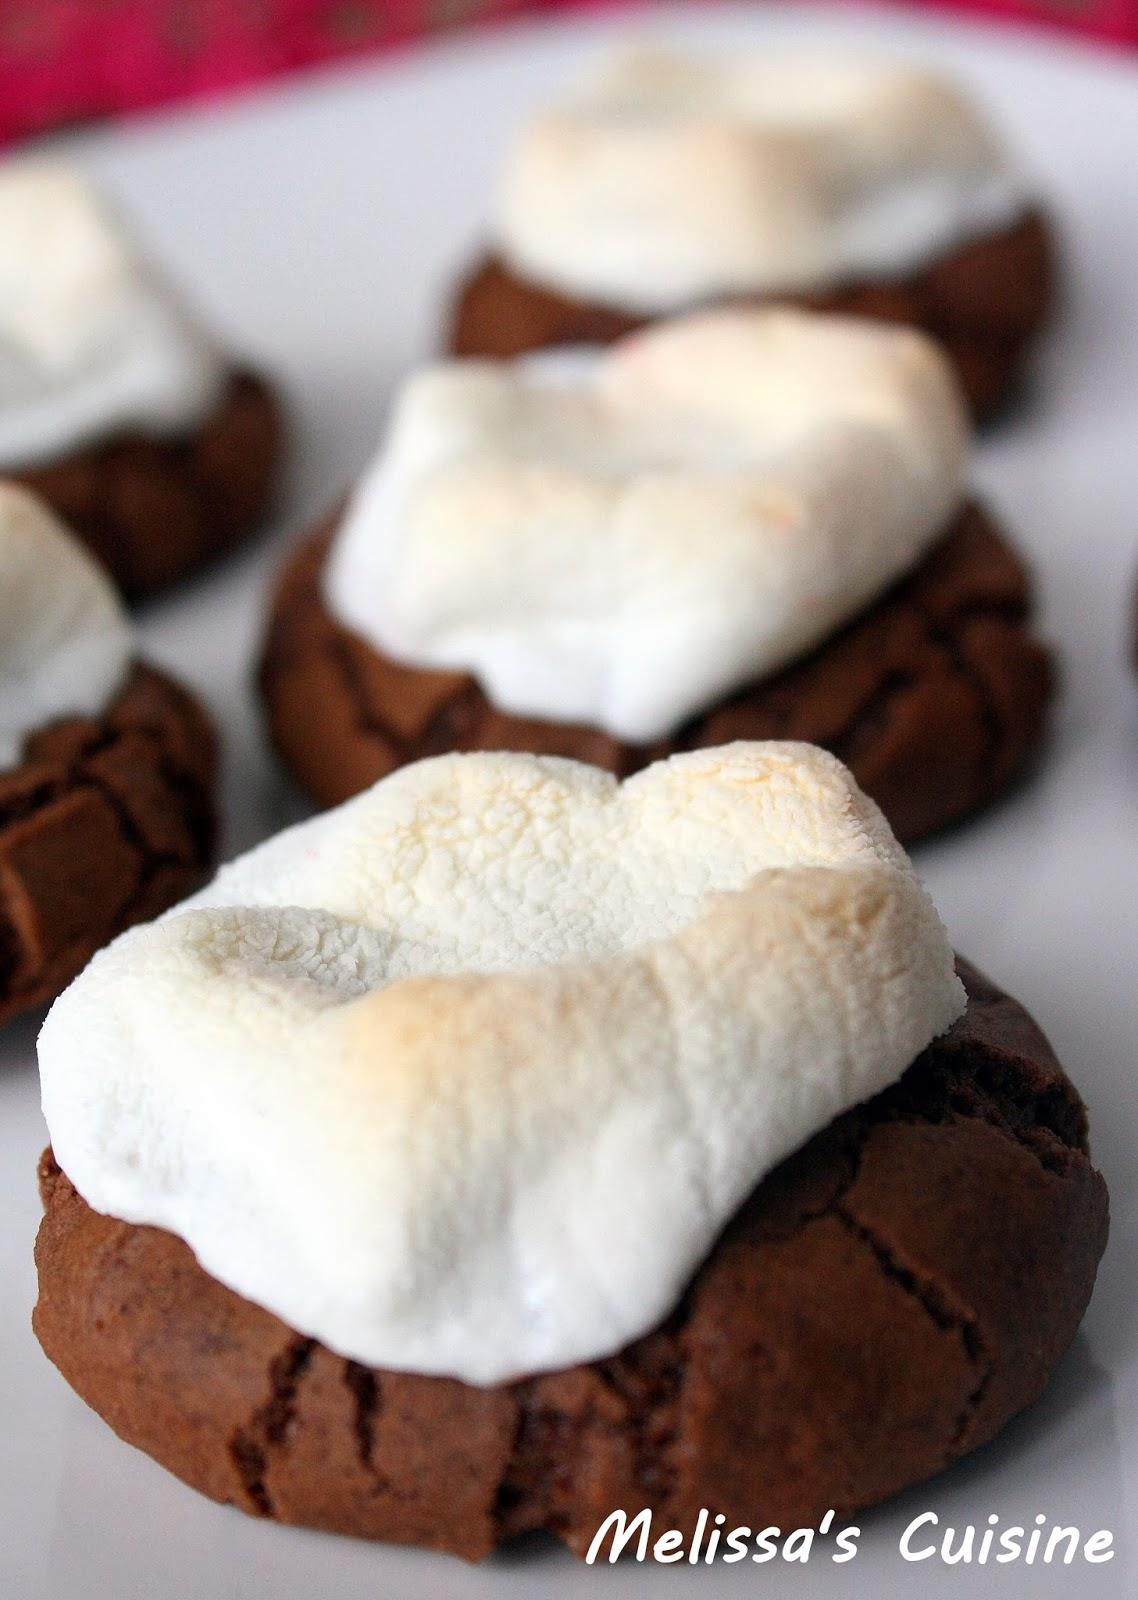 Melissa's Cuisine: Hot Chocolate Cookies